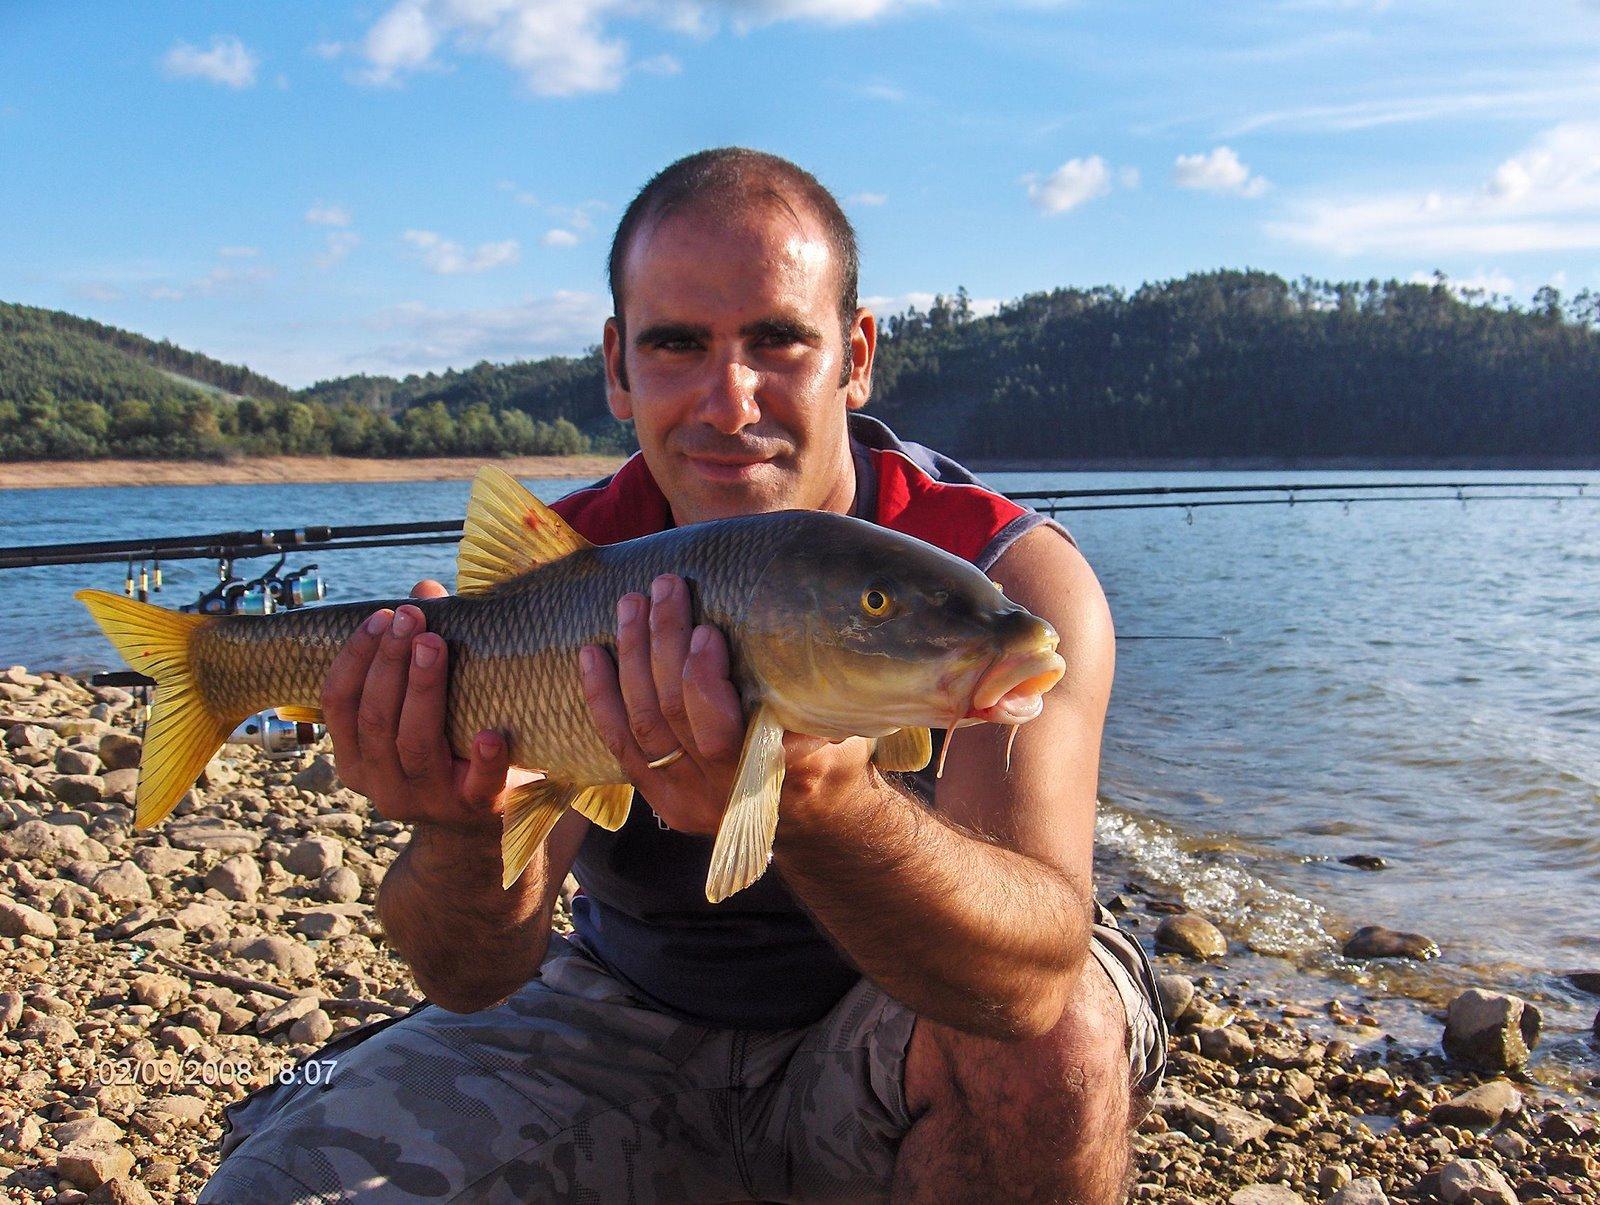 Barbo 2,4 kg Aguieira 2 Setembro 2008